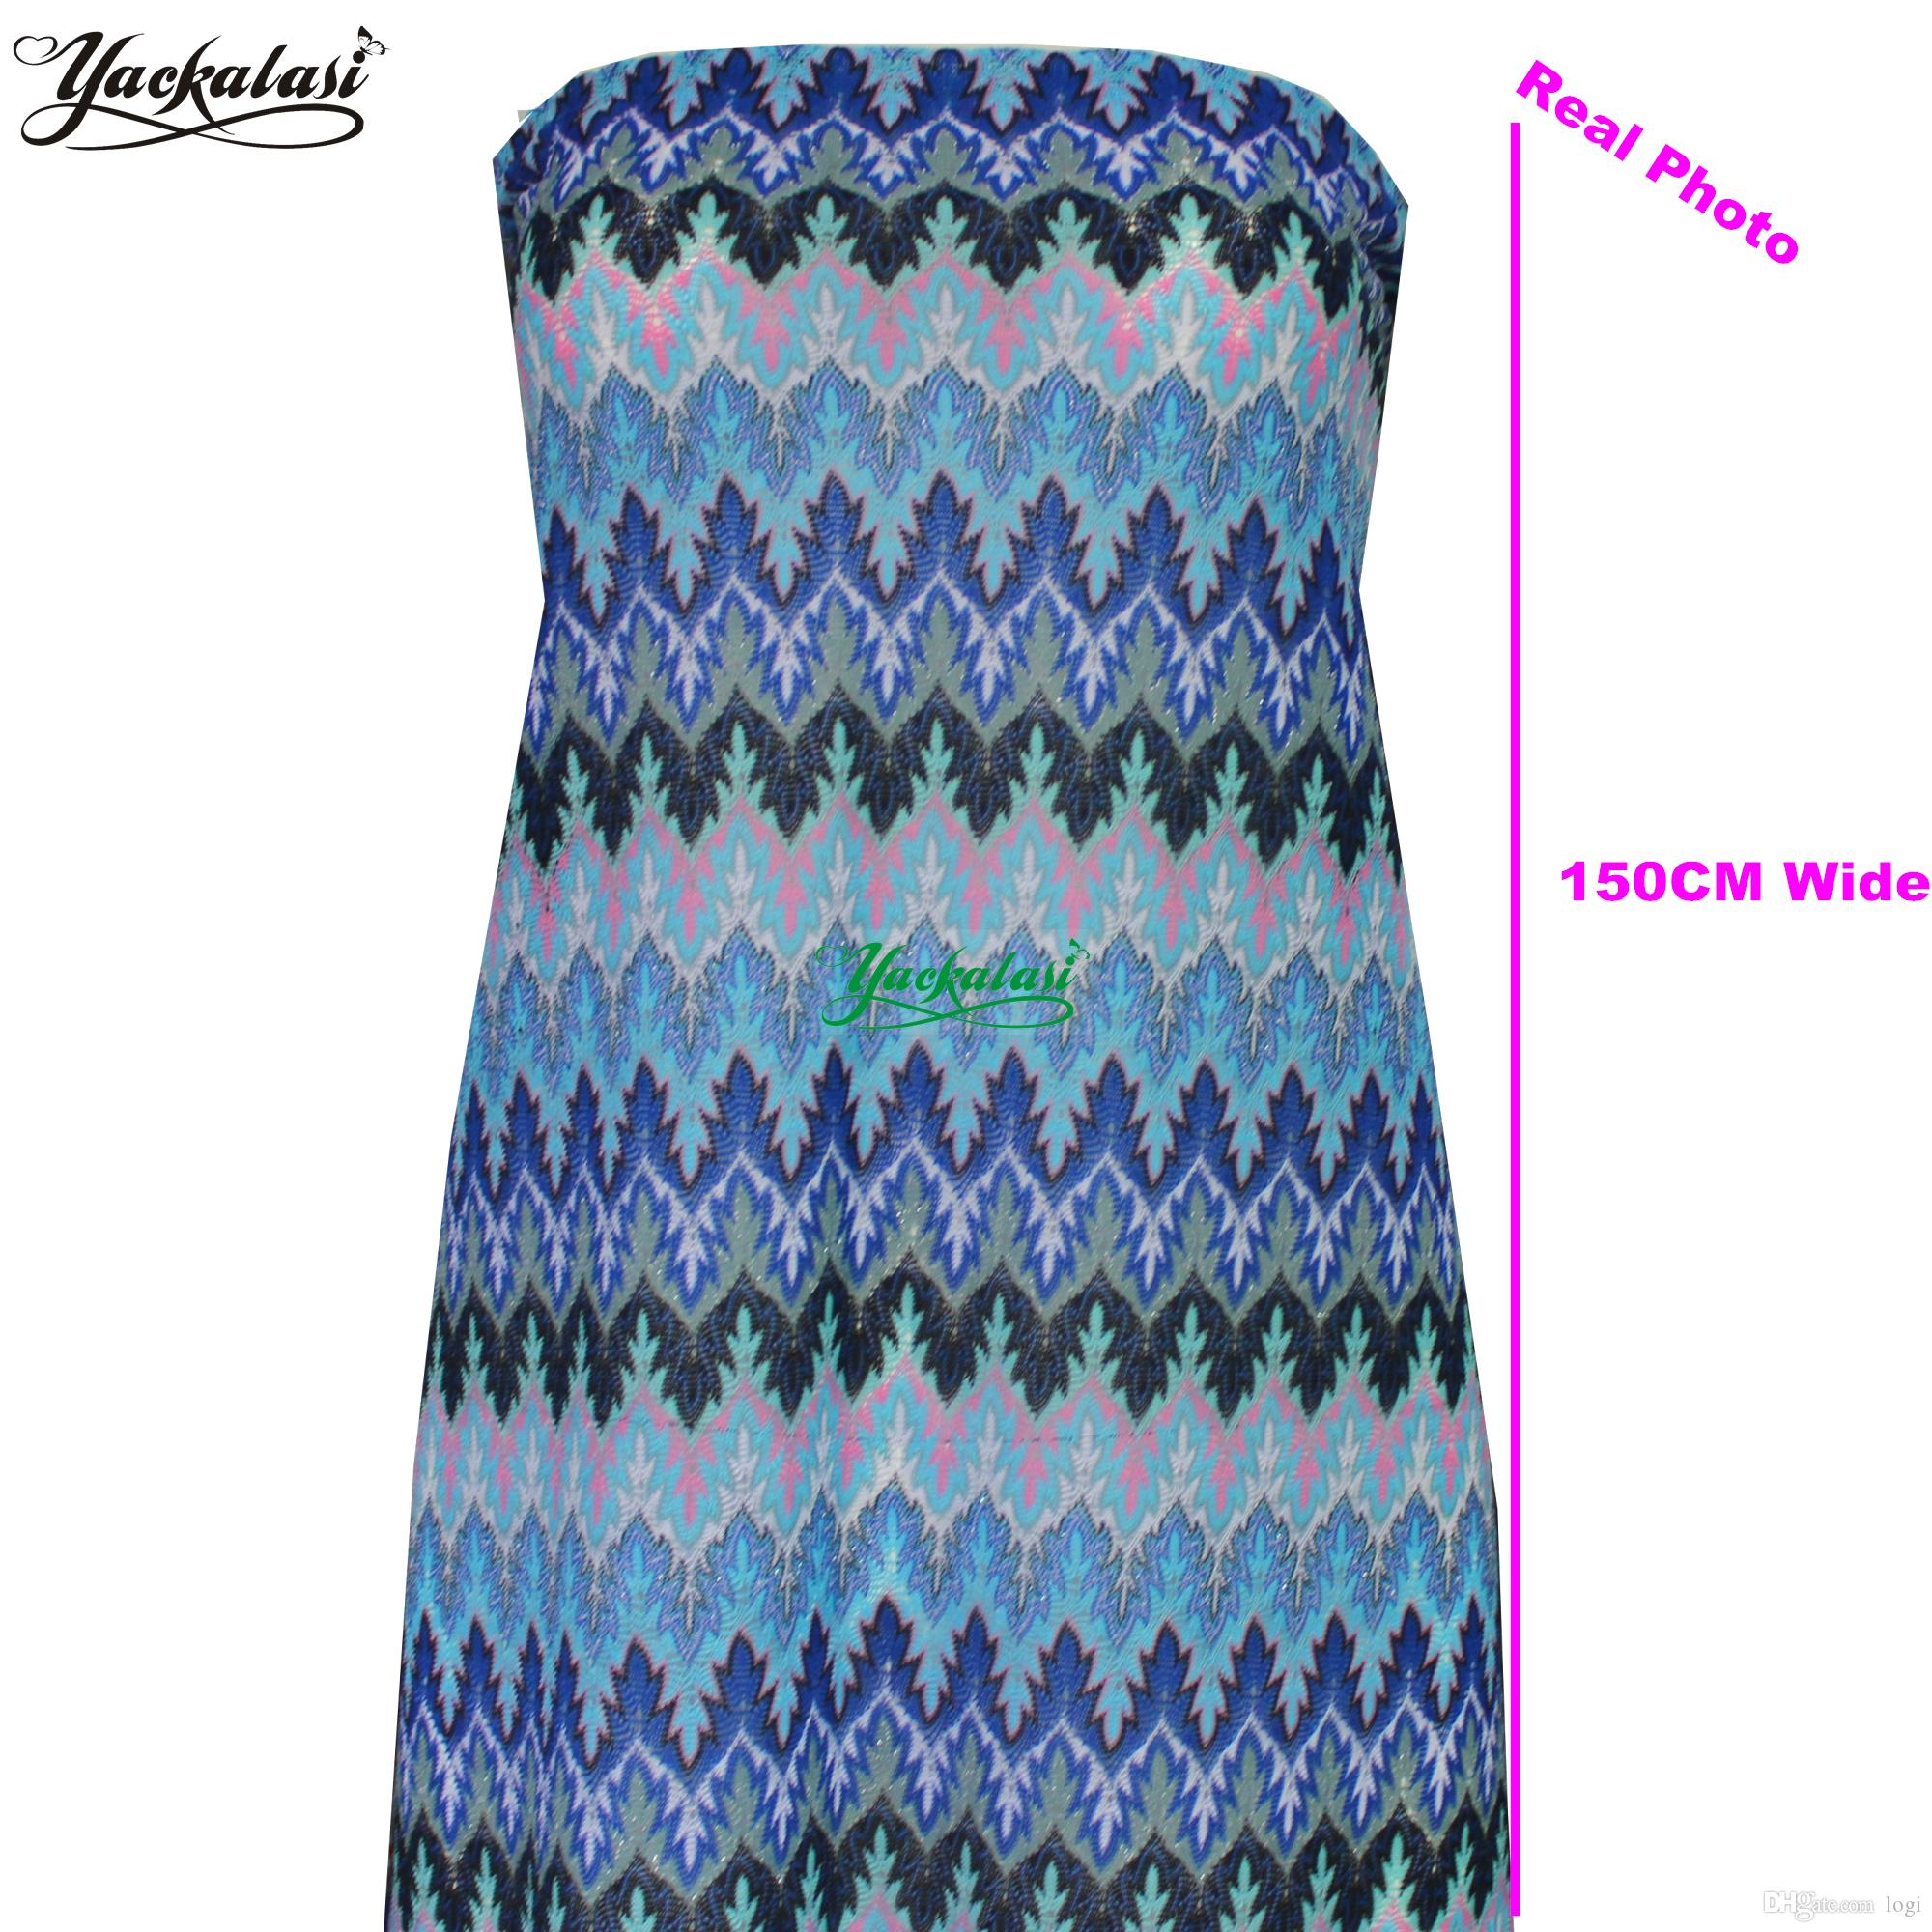 2018 Yackalasi 5 YardsMissoni Knitting Lace Fabrics Wave Strip ...